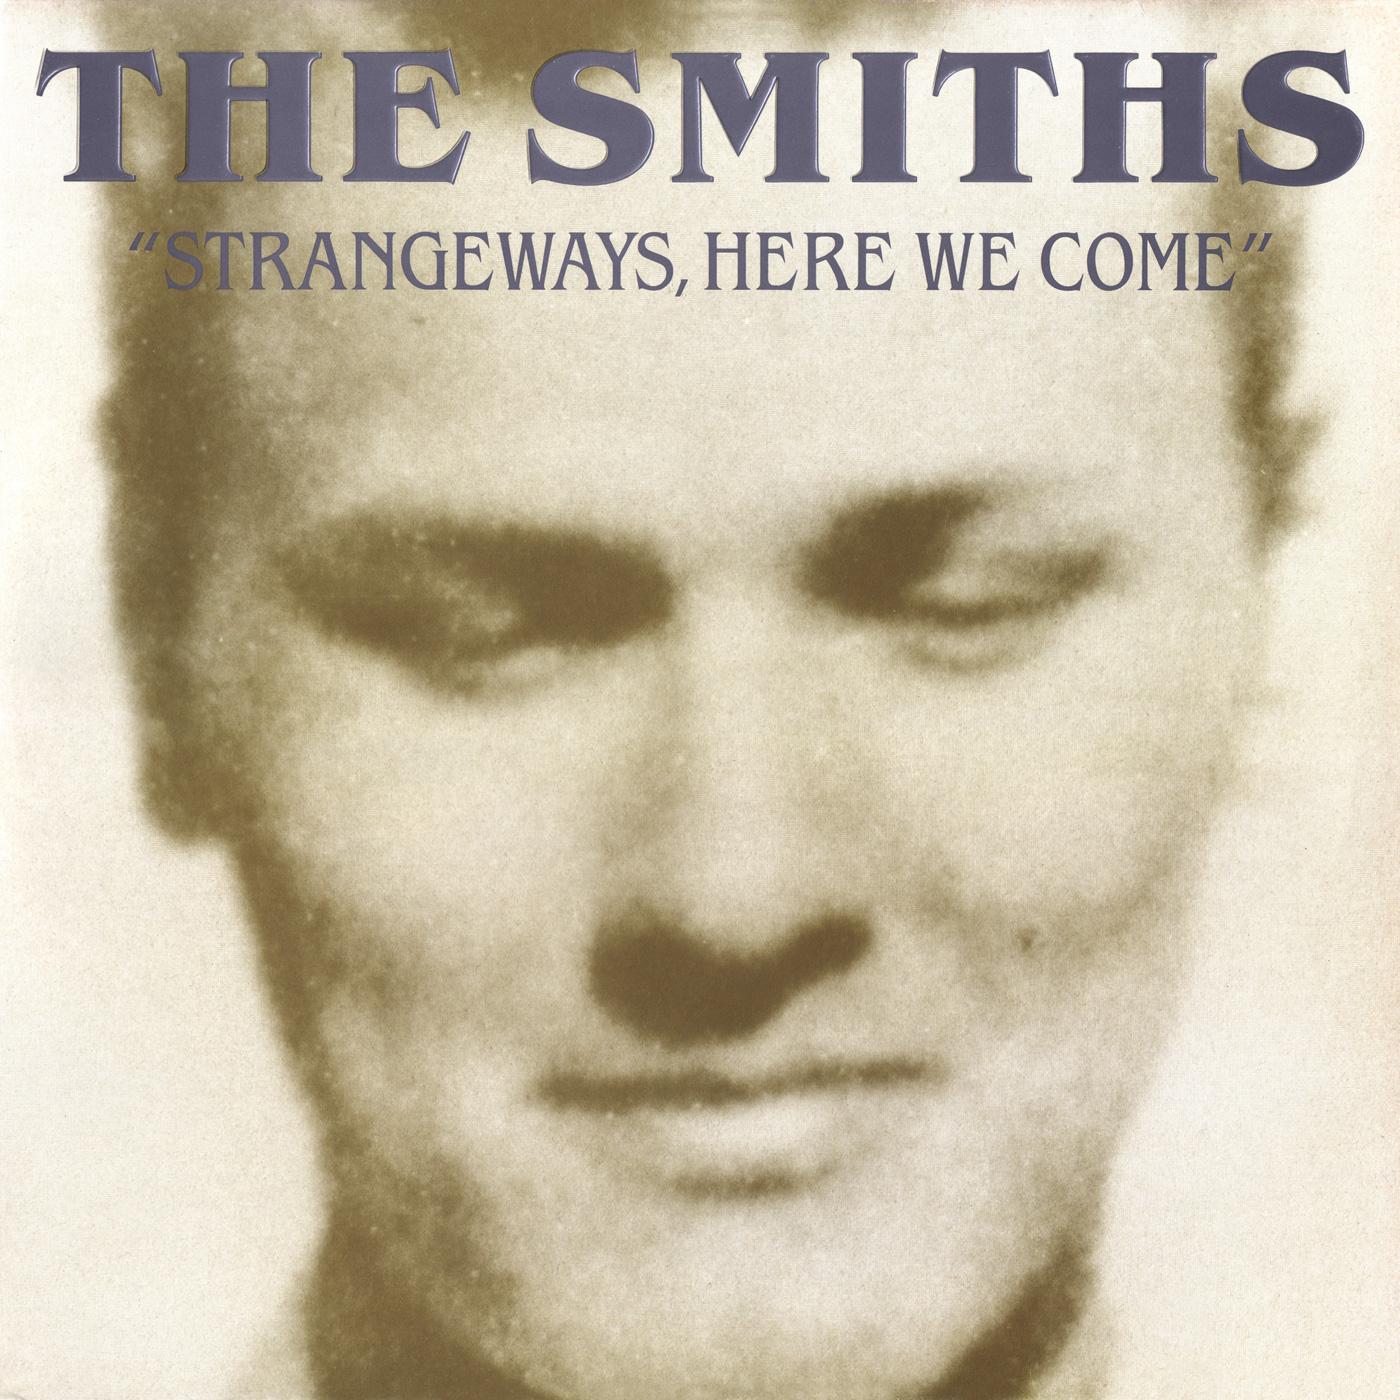 1987 - Strangeways Here We Come